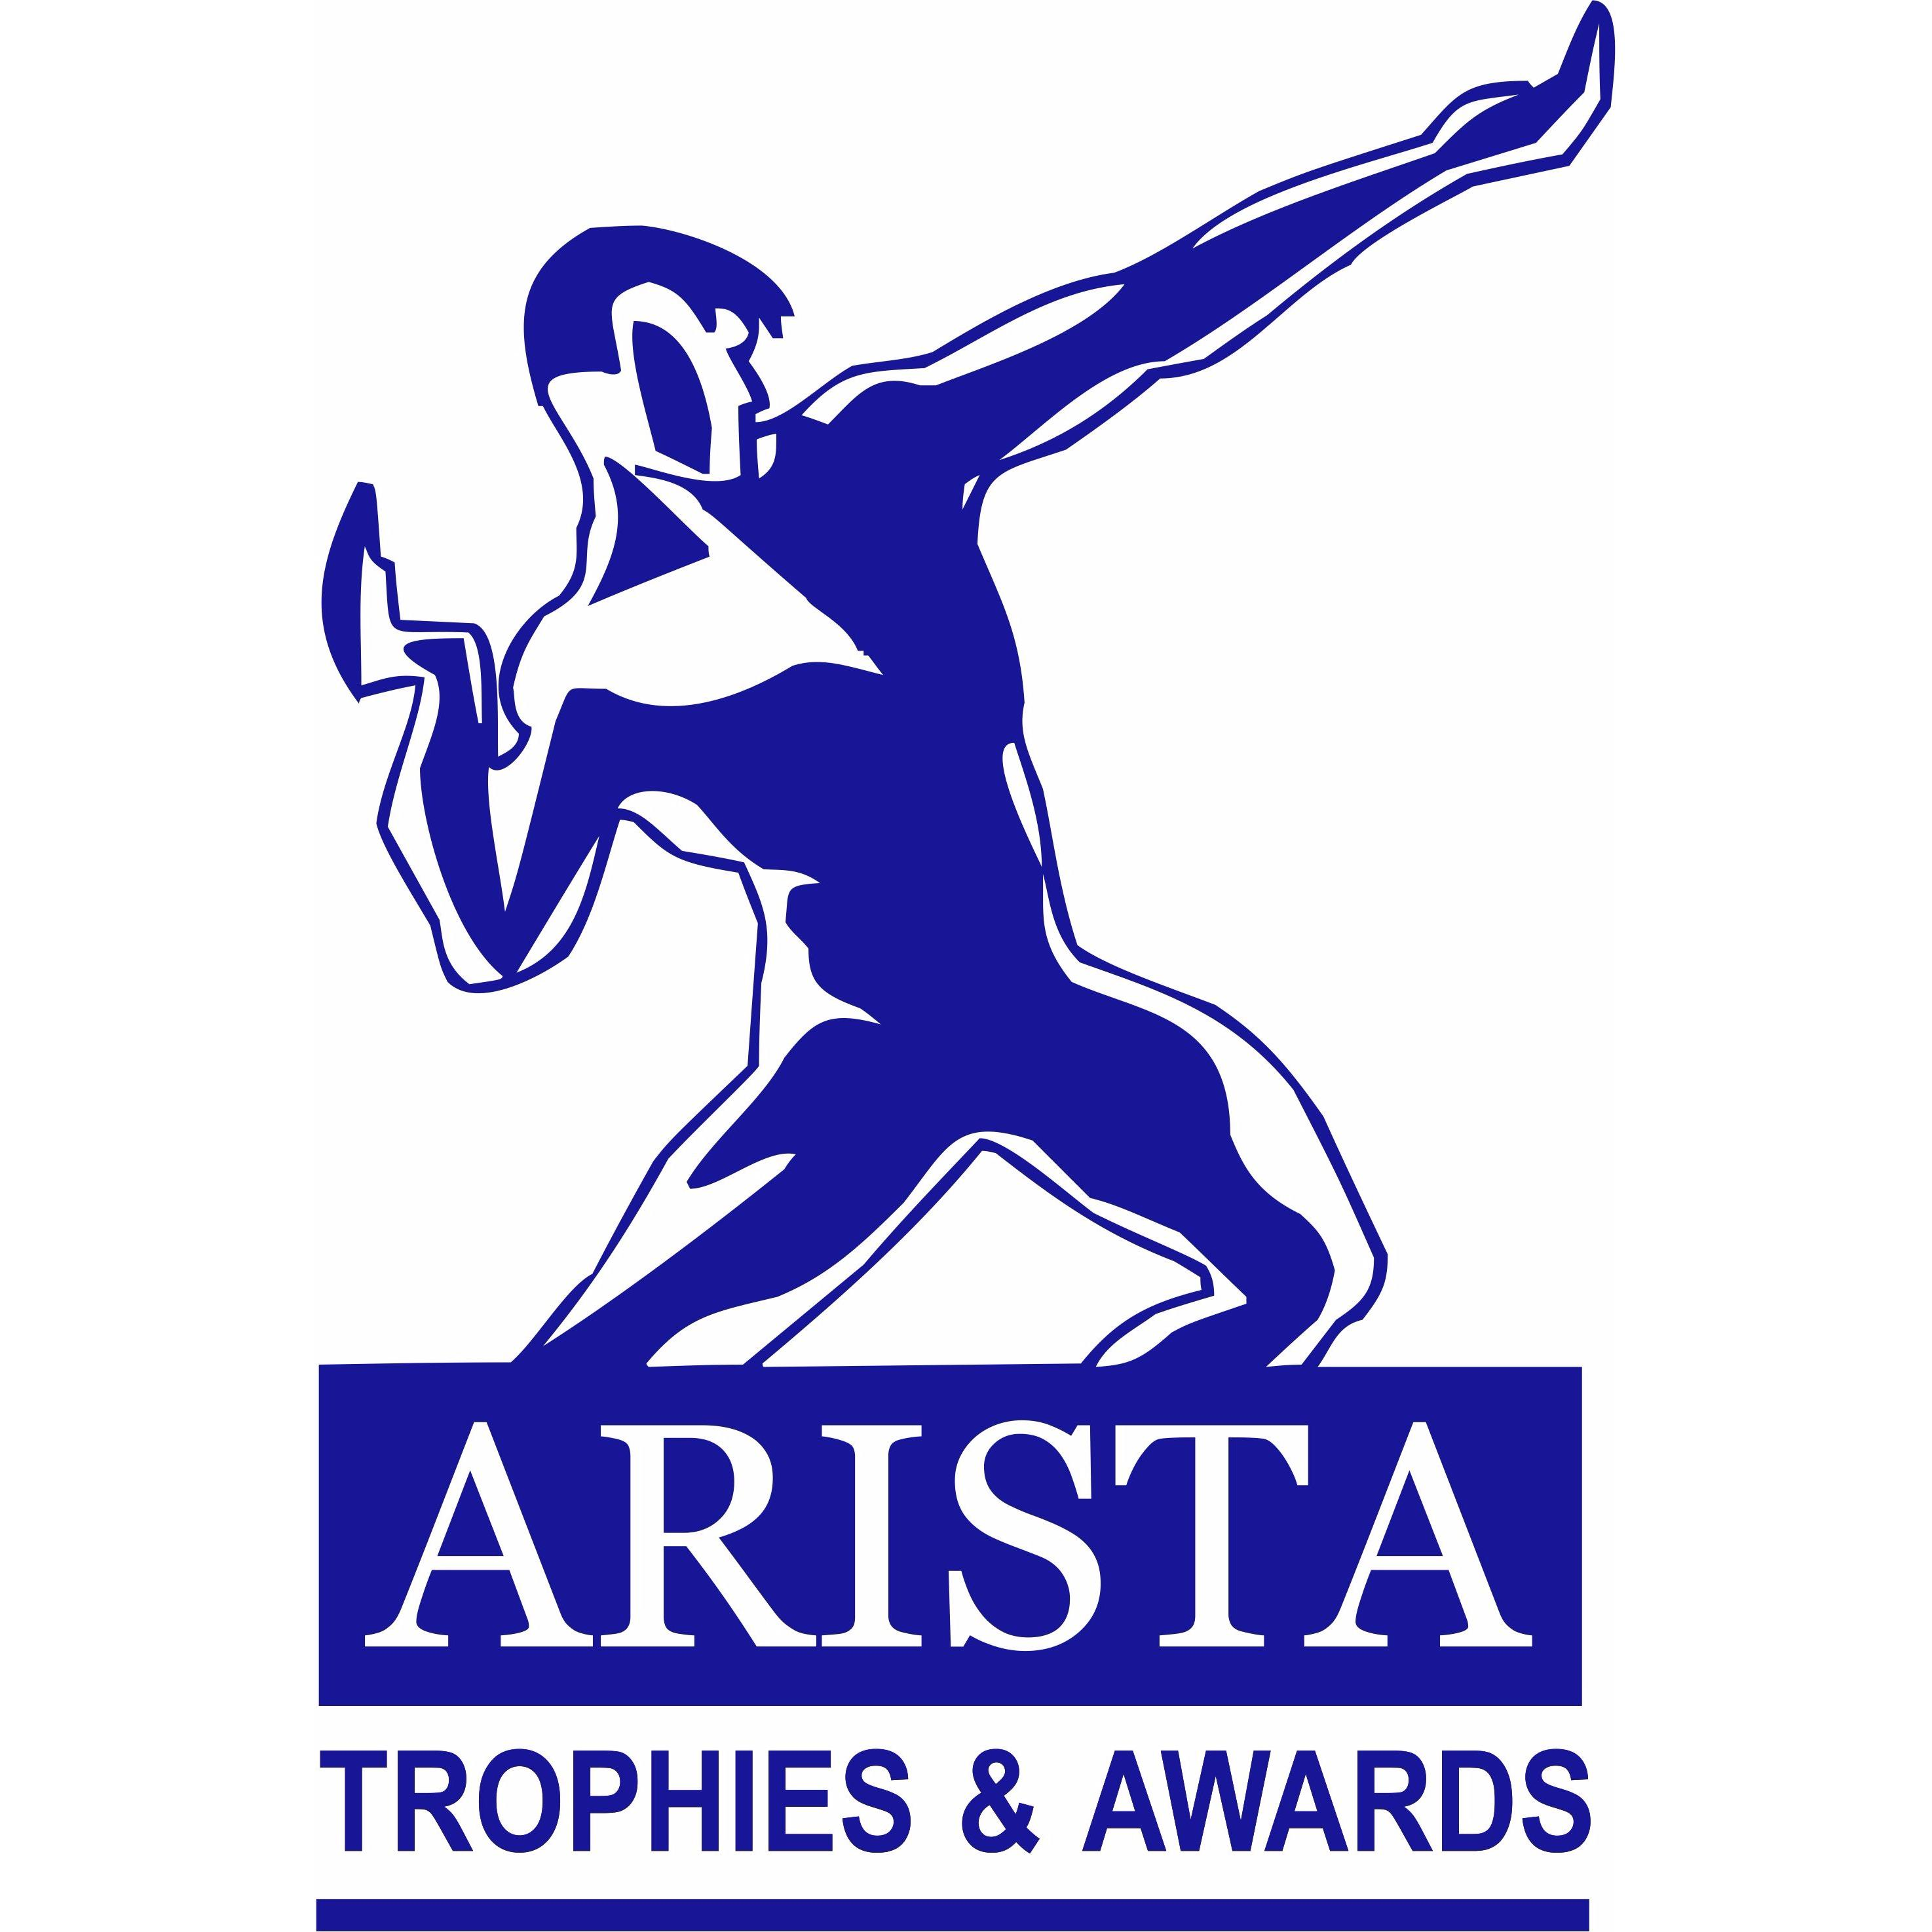 Arista Trophies & Awards Bergenfield NJ | Glassware Engravers